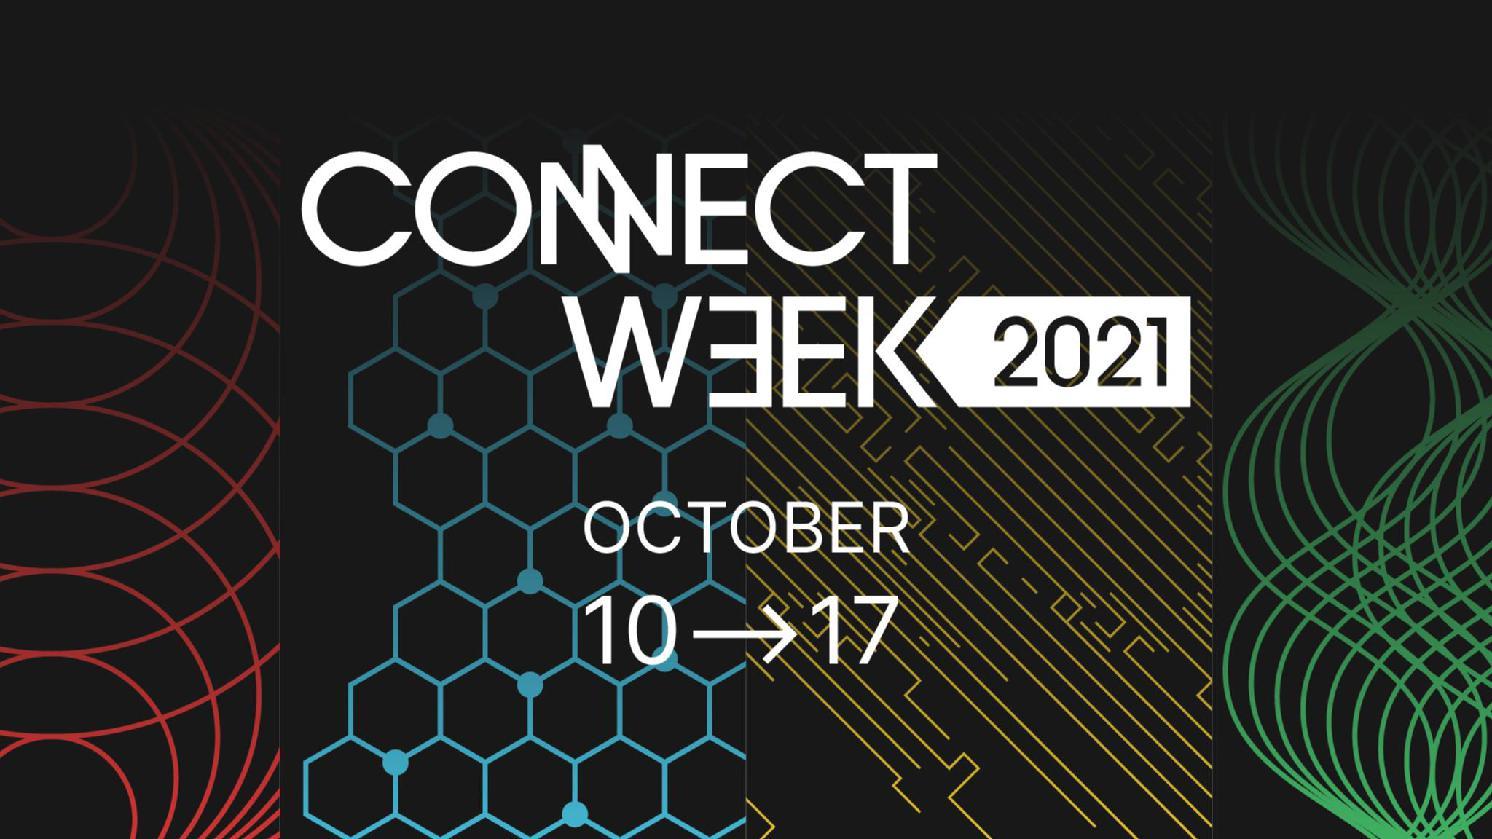 Innovate Pasadena presents Connect Week 2021